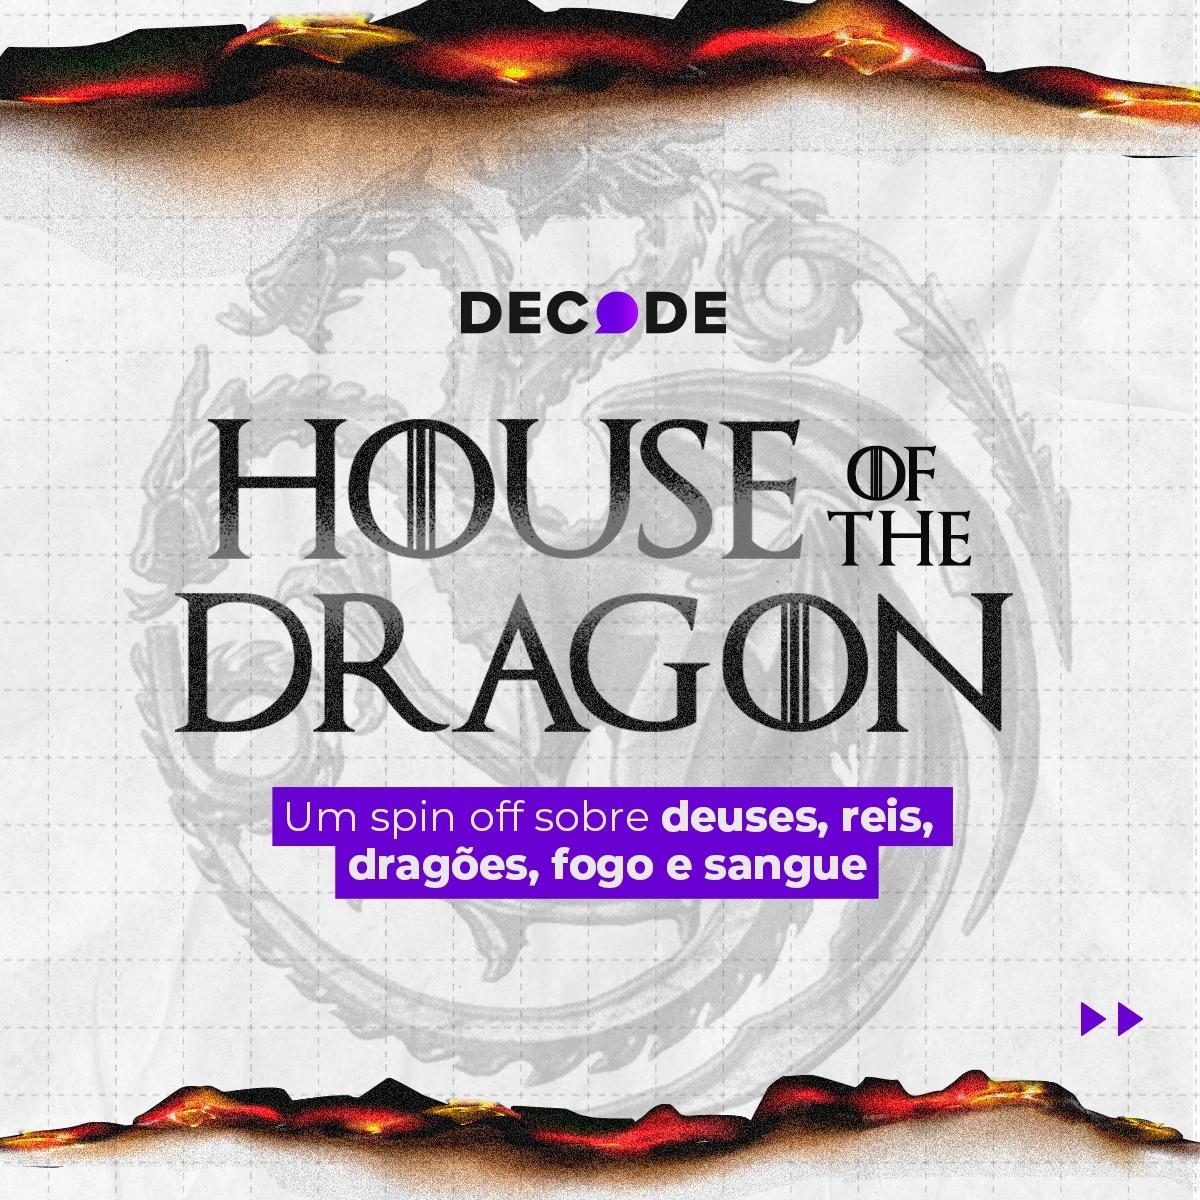 House of The Dragon, o spin off de Game of Thrones